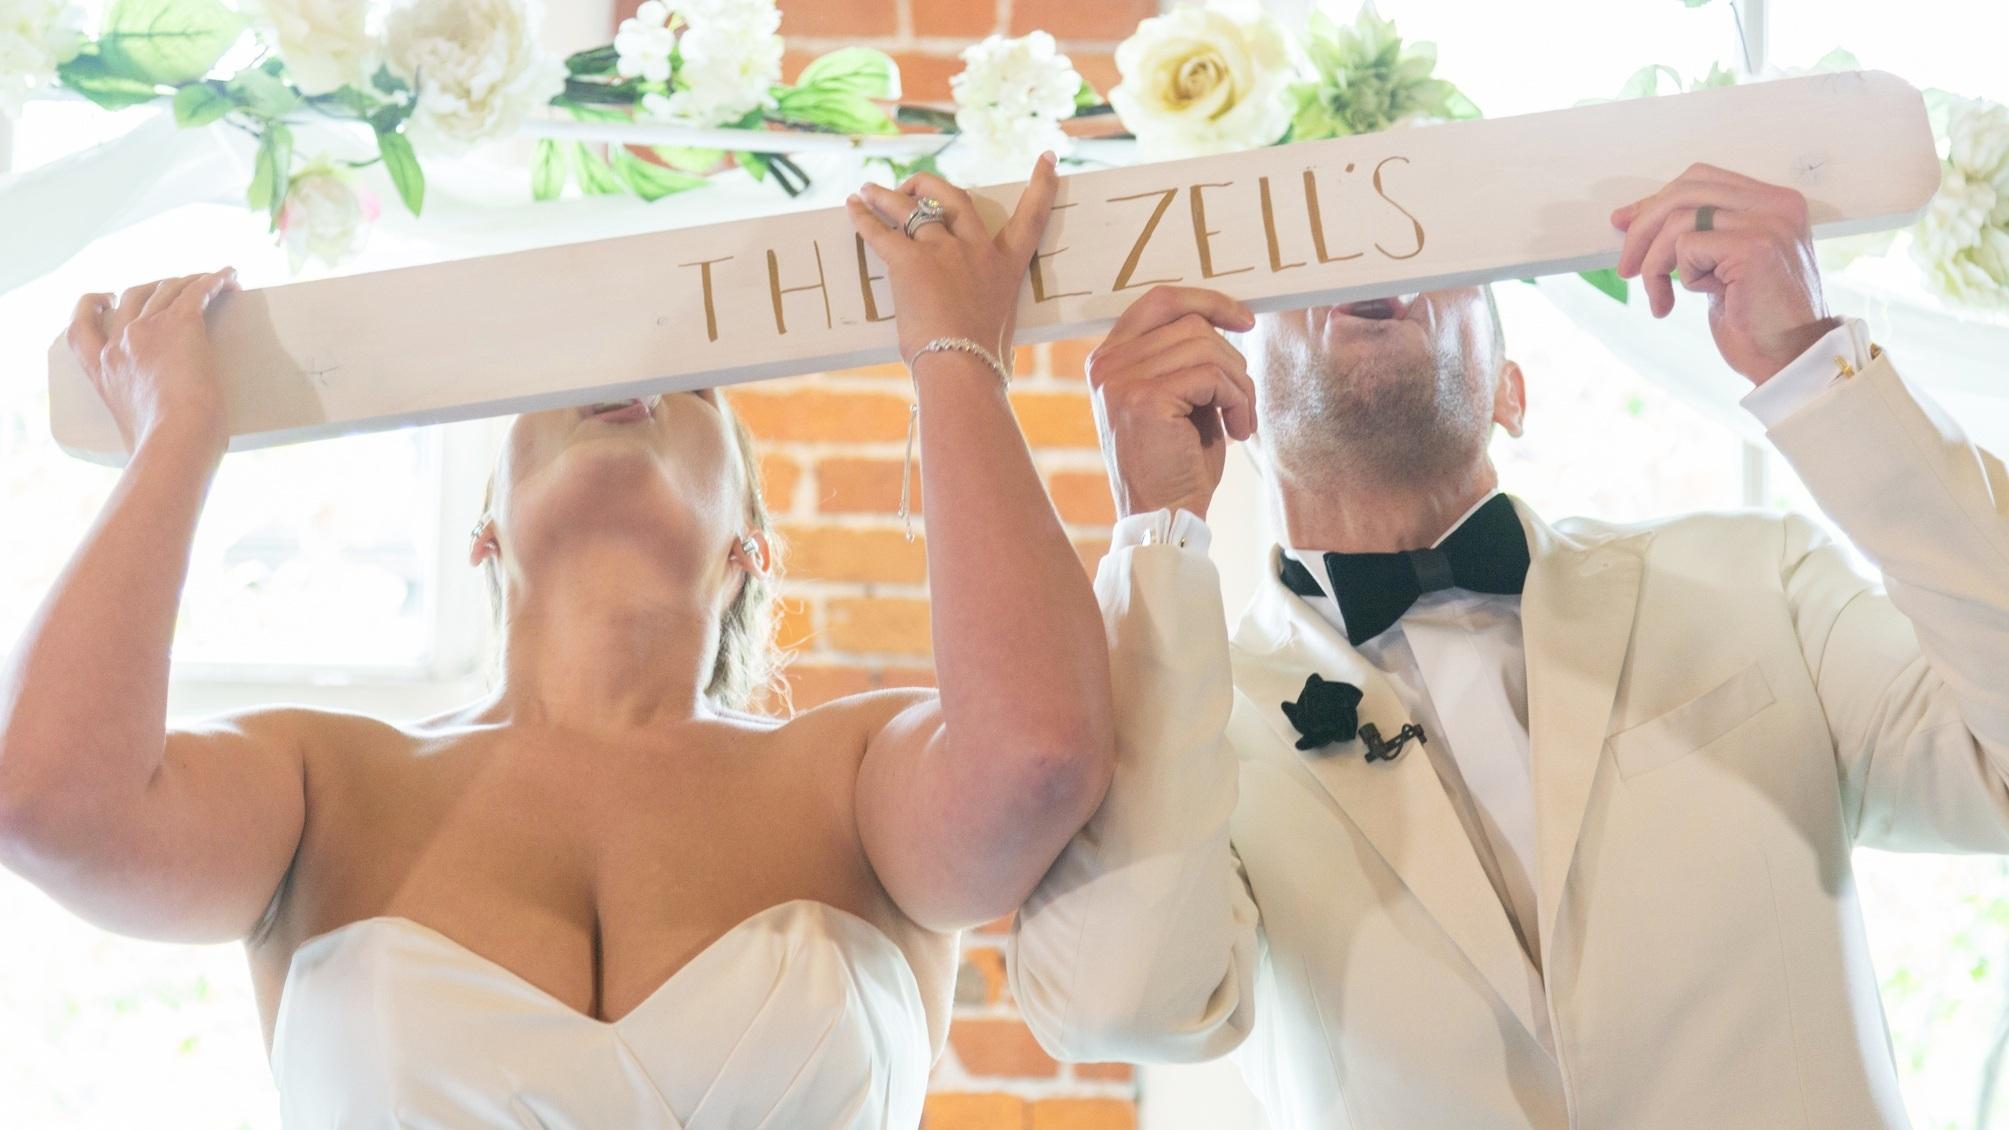 Glenn & Kayla - Married 4 / 27 / 2019